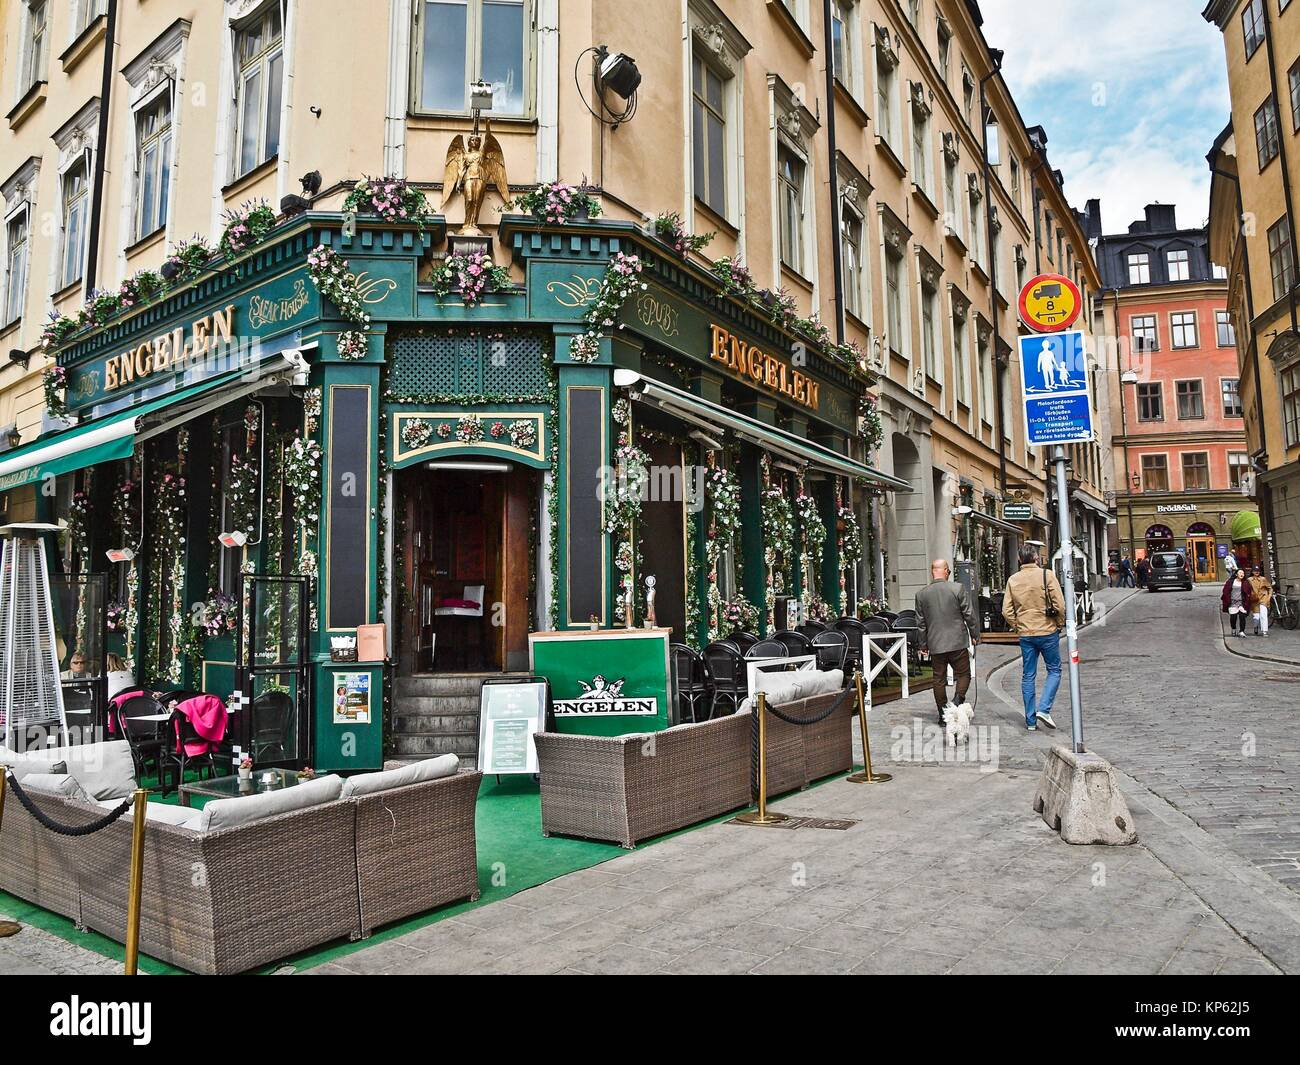 Engelen pub in Gamla Stan, Stockholm, Sweden. - Stock Image